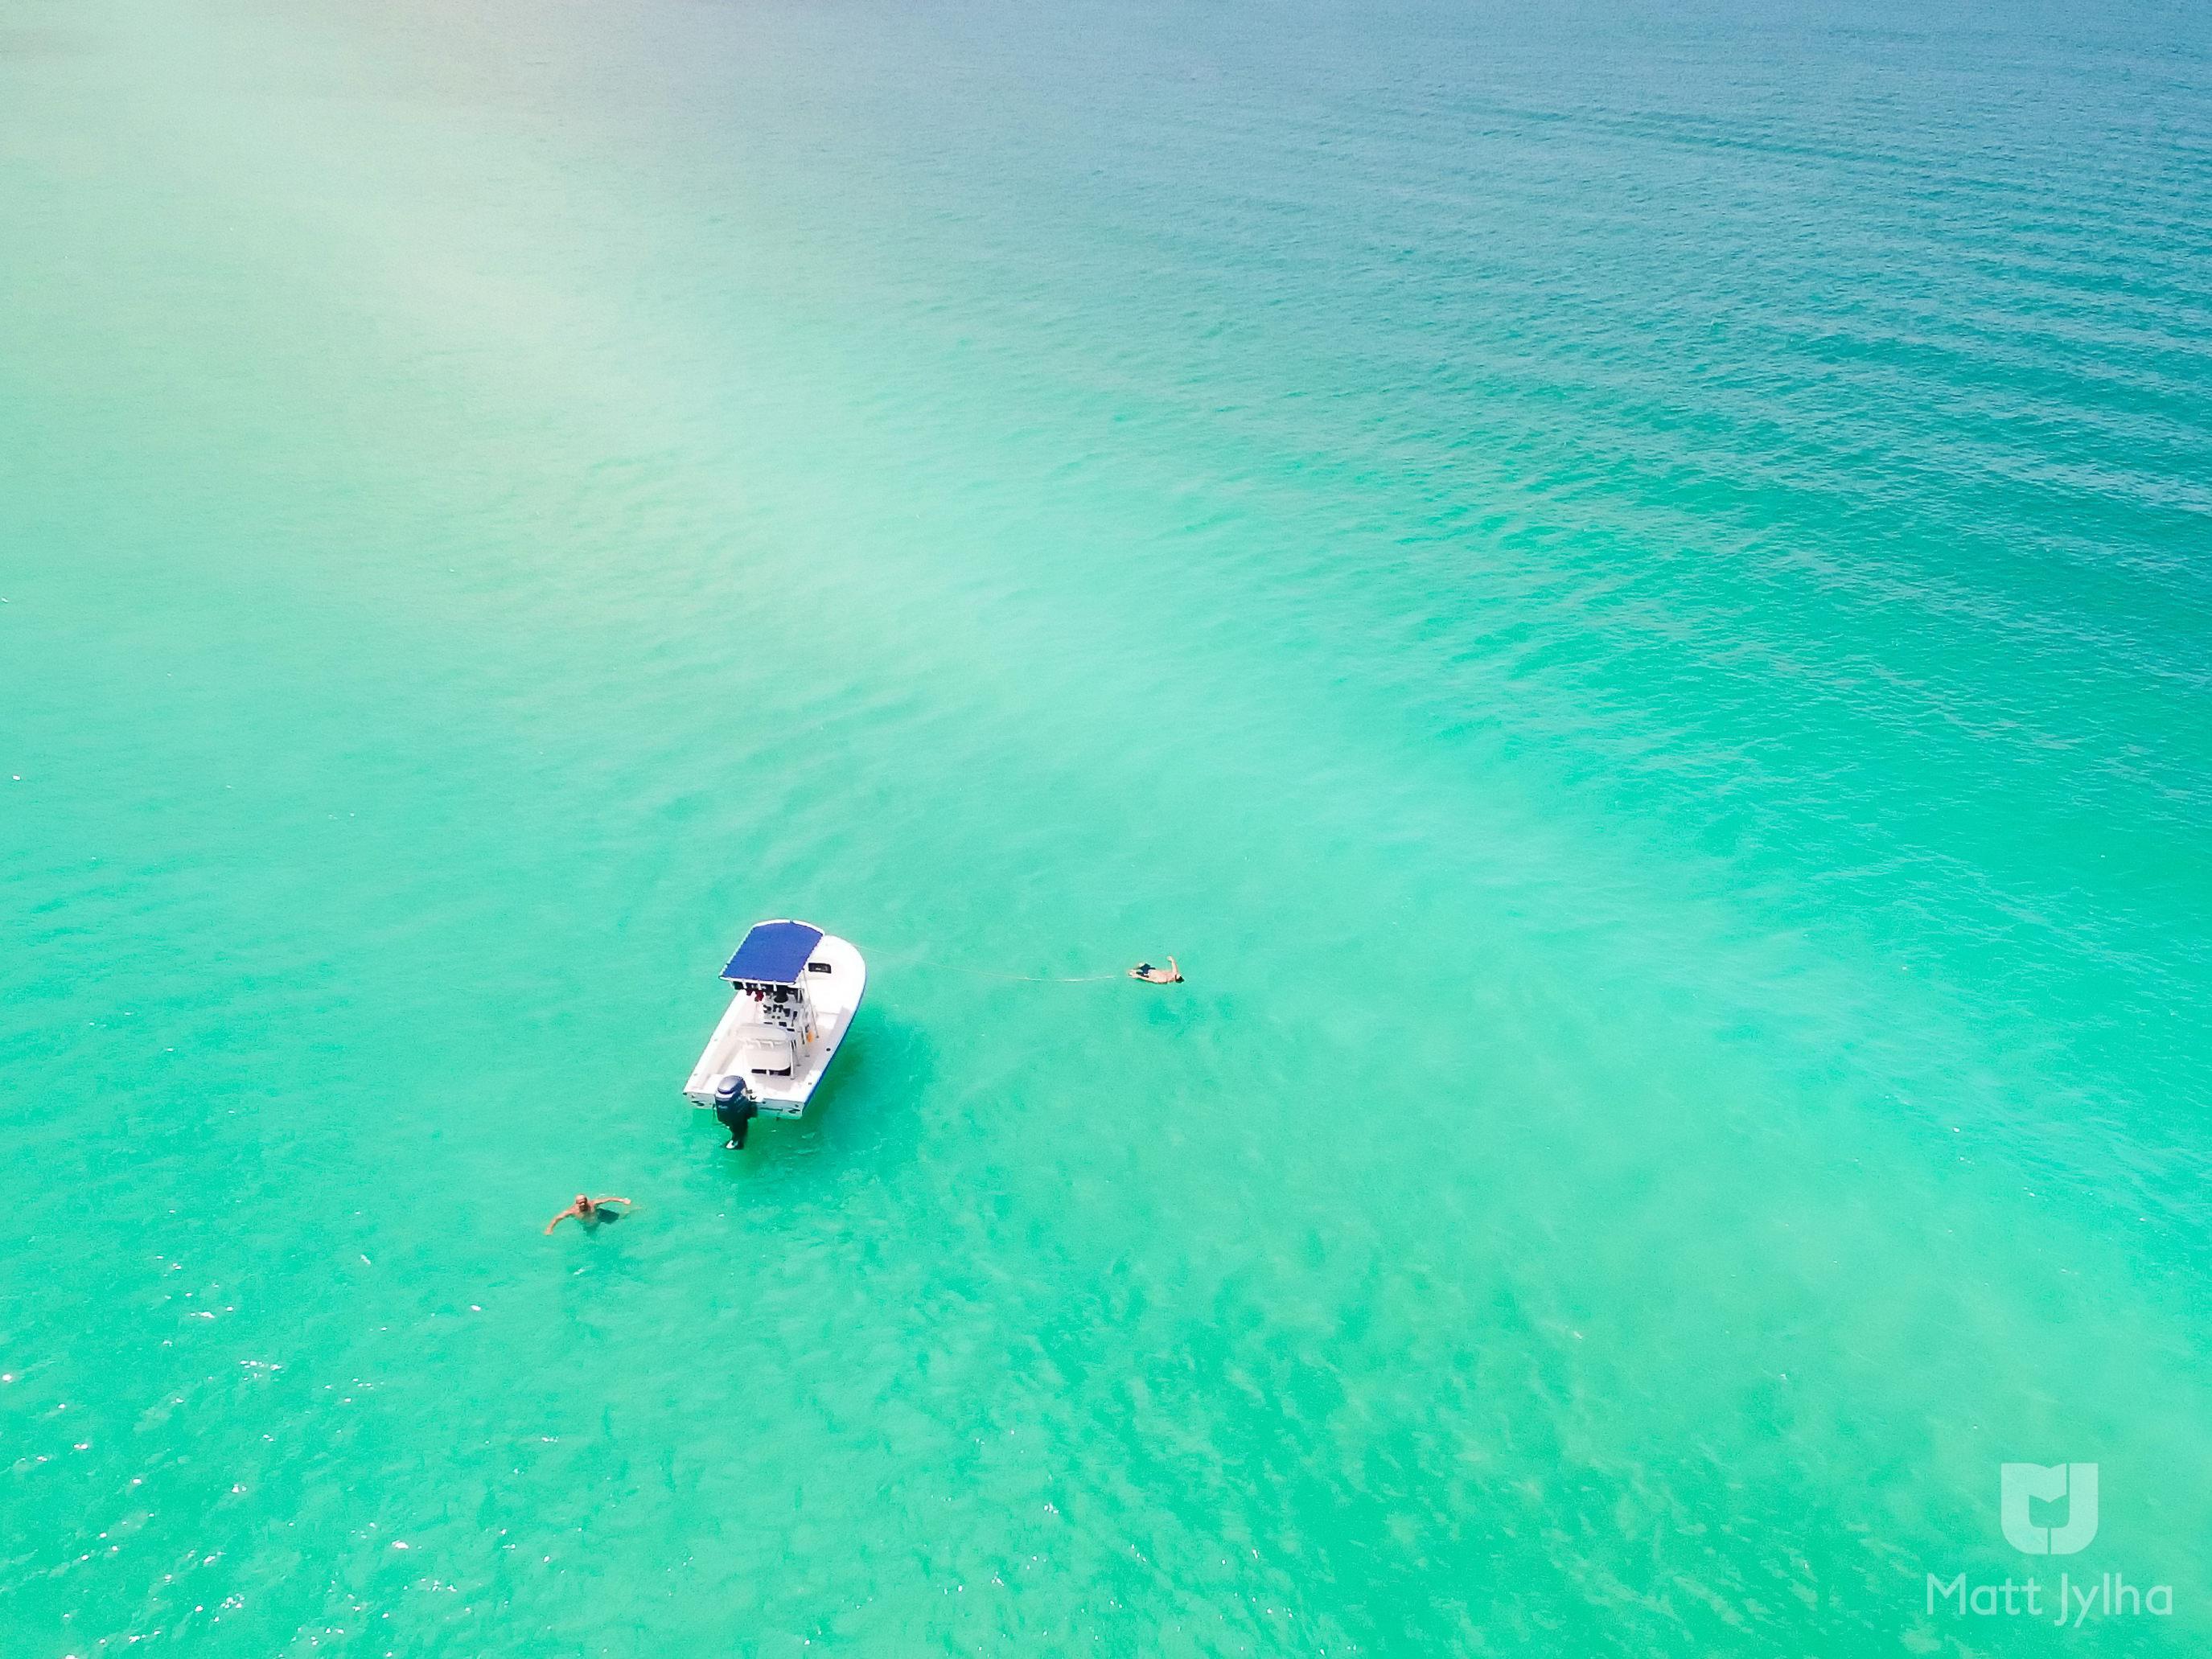 Orlando_Aerial_Photographer_Matt_Jylha_013